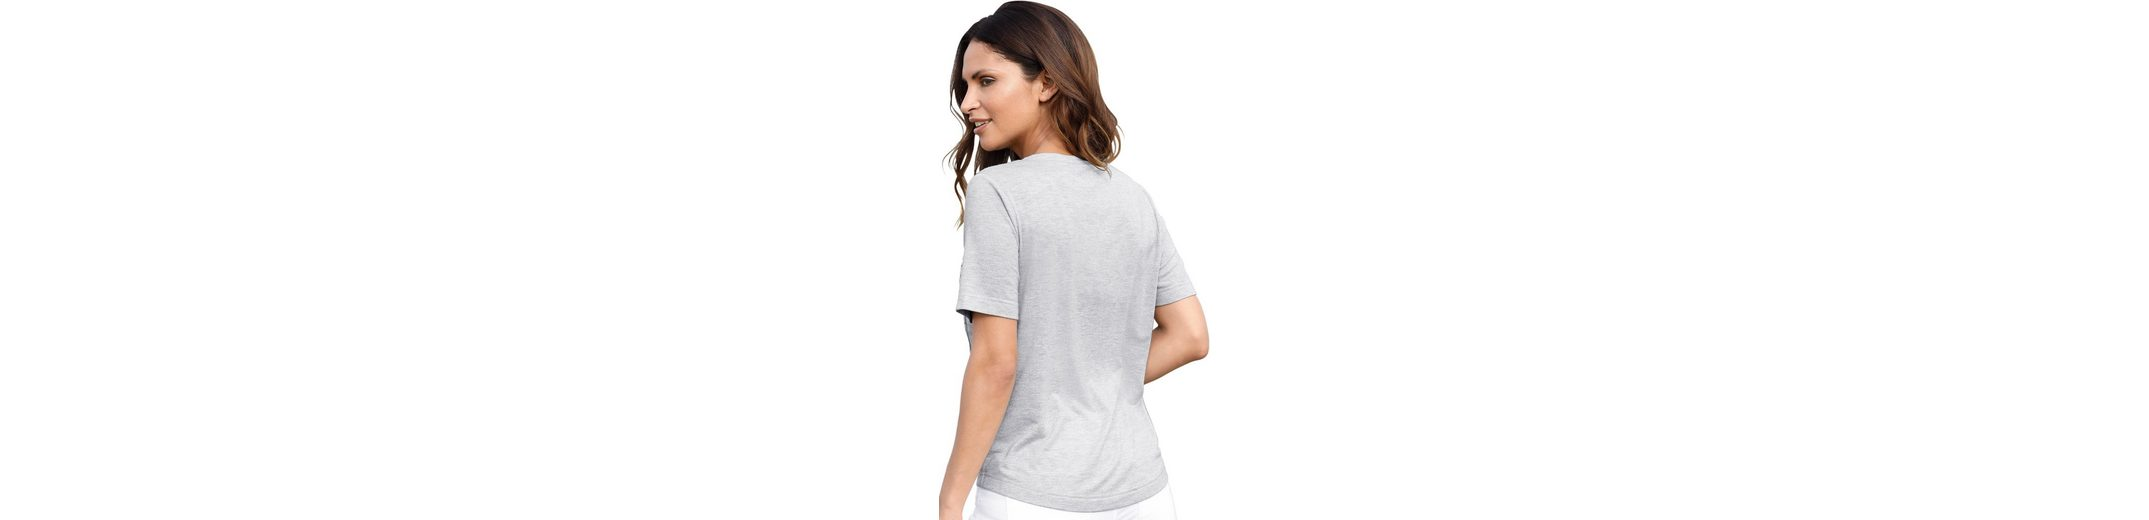 Classic Inspirationen Shirt mit Glitzer-Effekt Billige Websites sfgiuUmTw